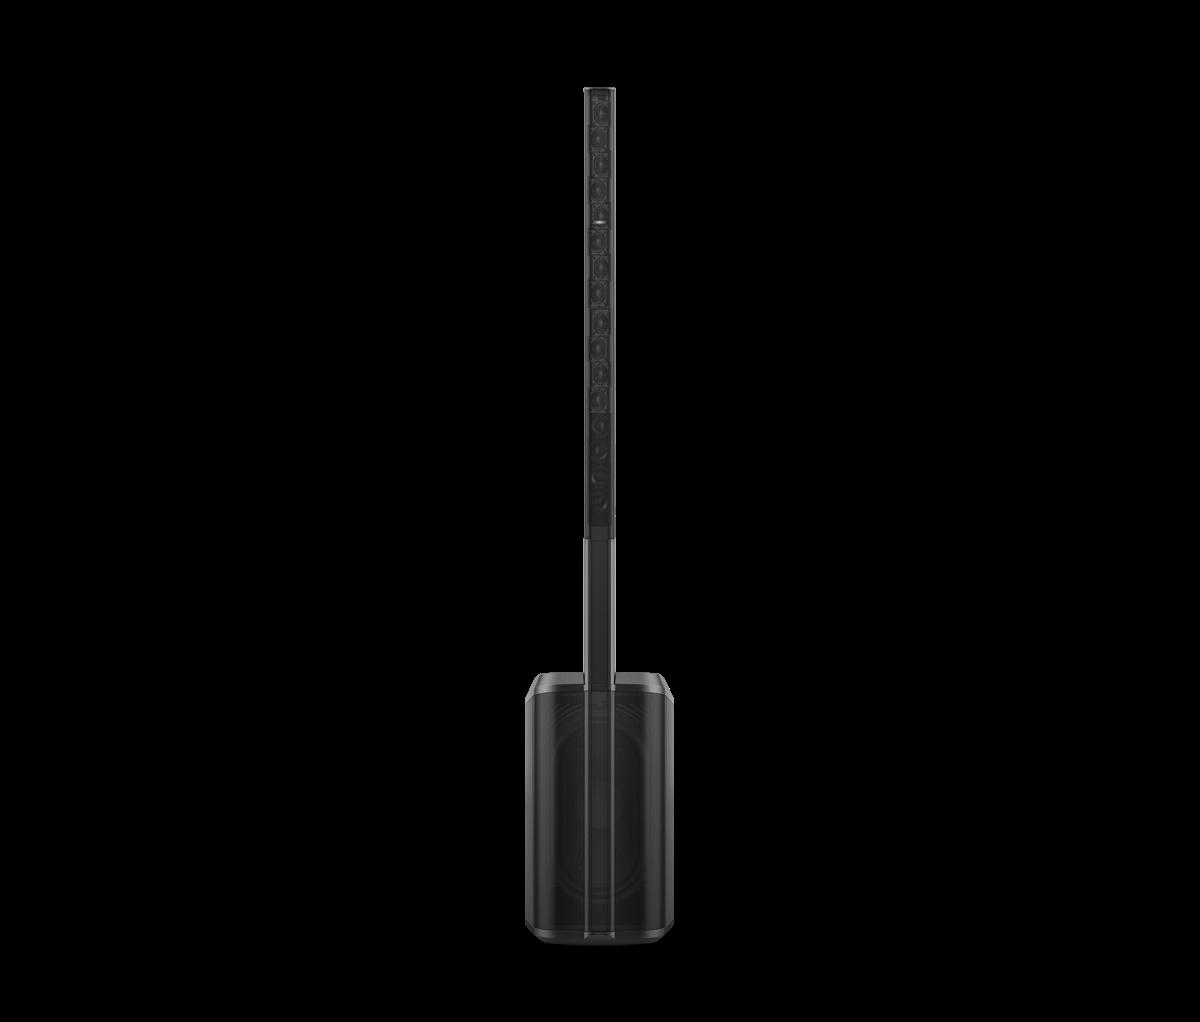 Bose L1 Pro16 Portable Line Array System Black 840920-1100